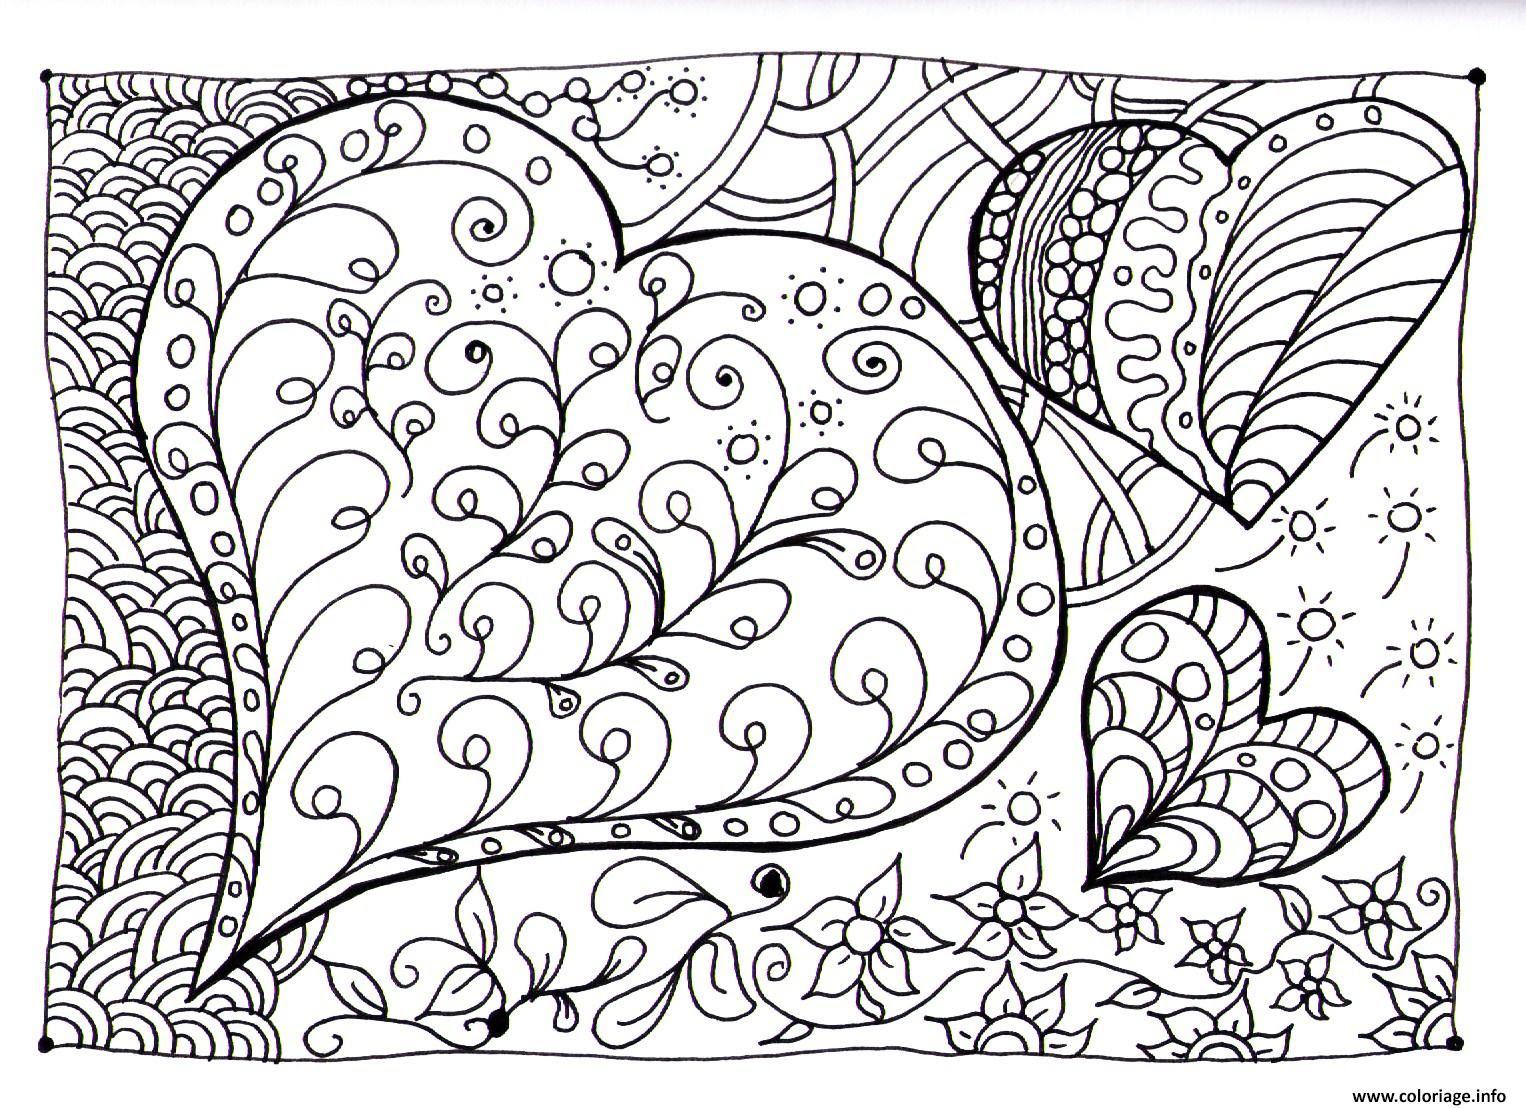 Coloriage Coeur Zen Dessin  Imprimer